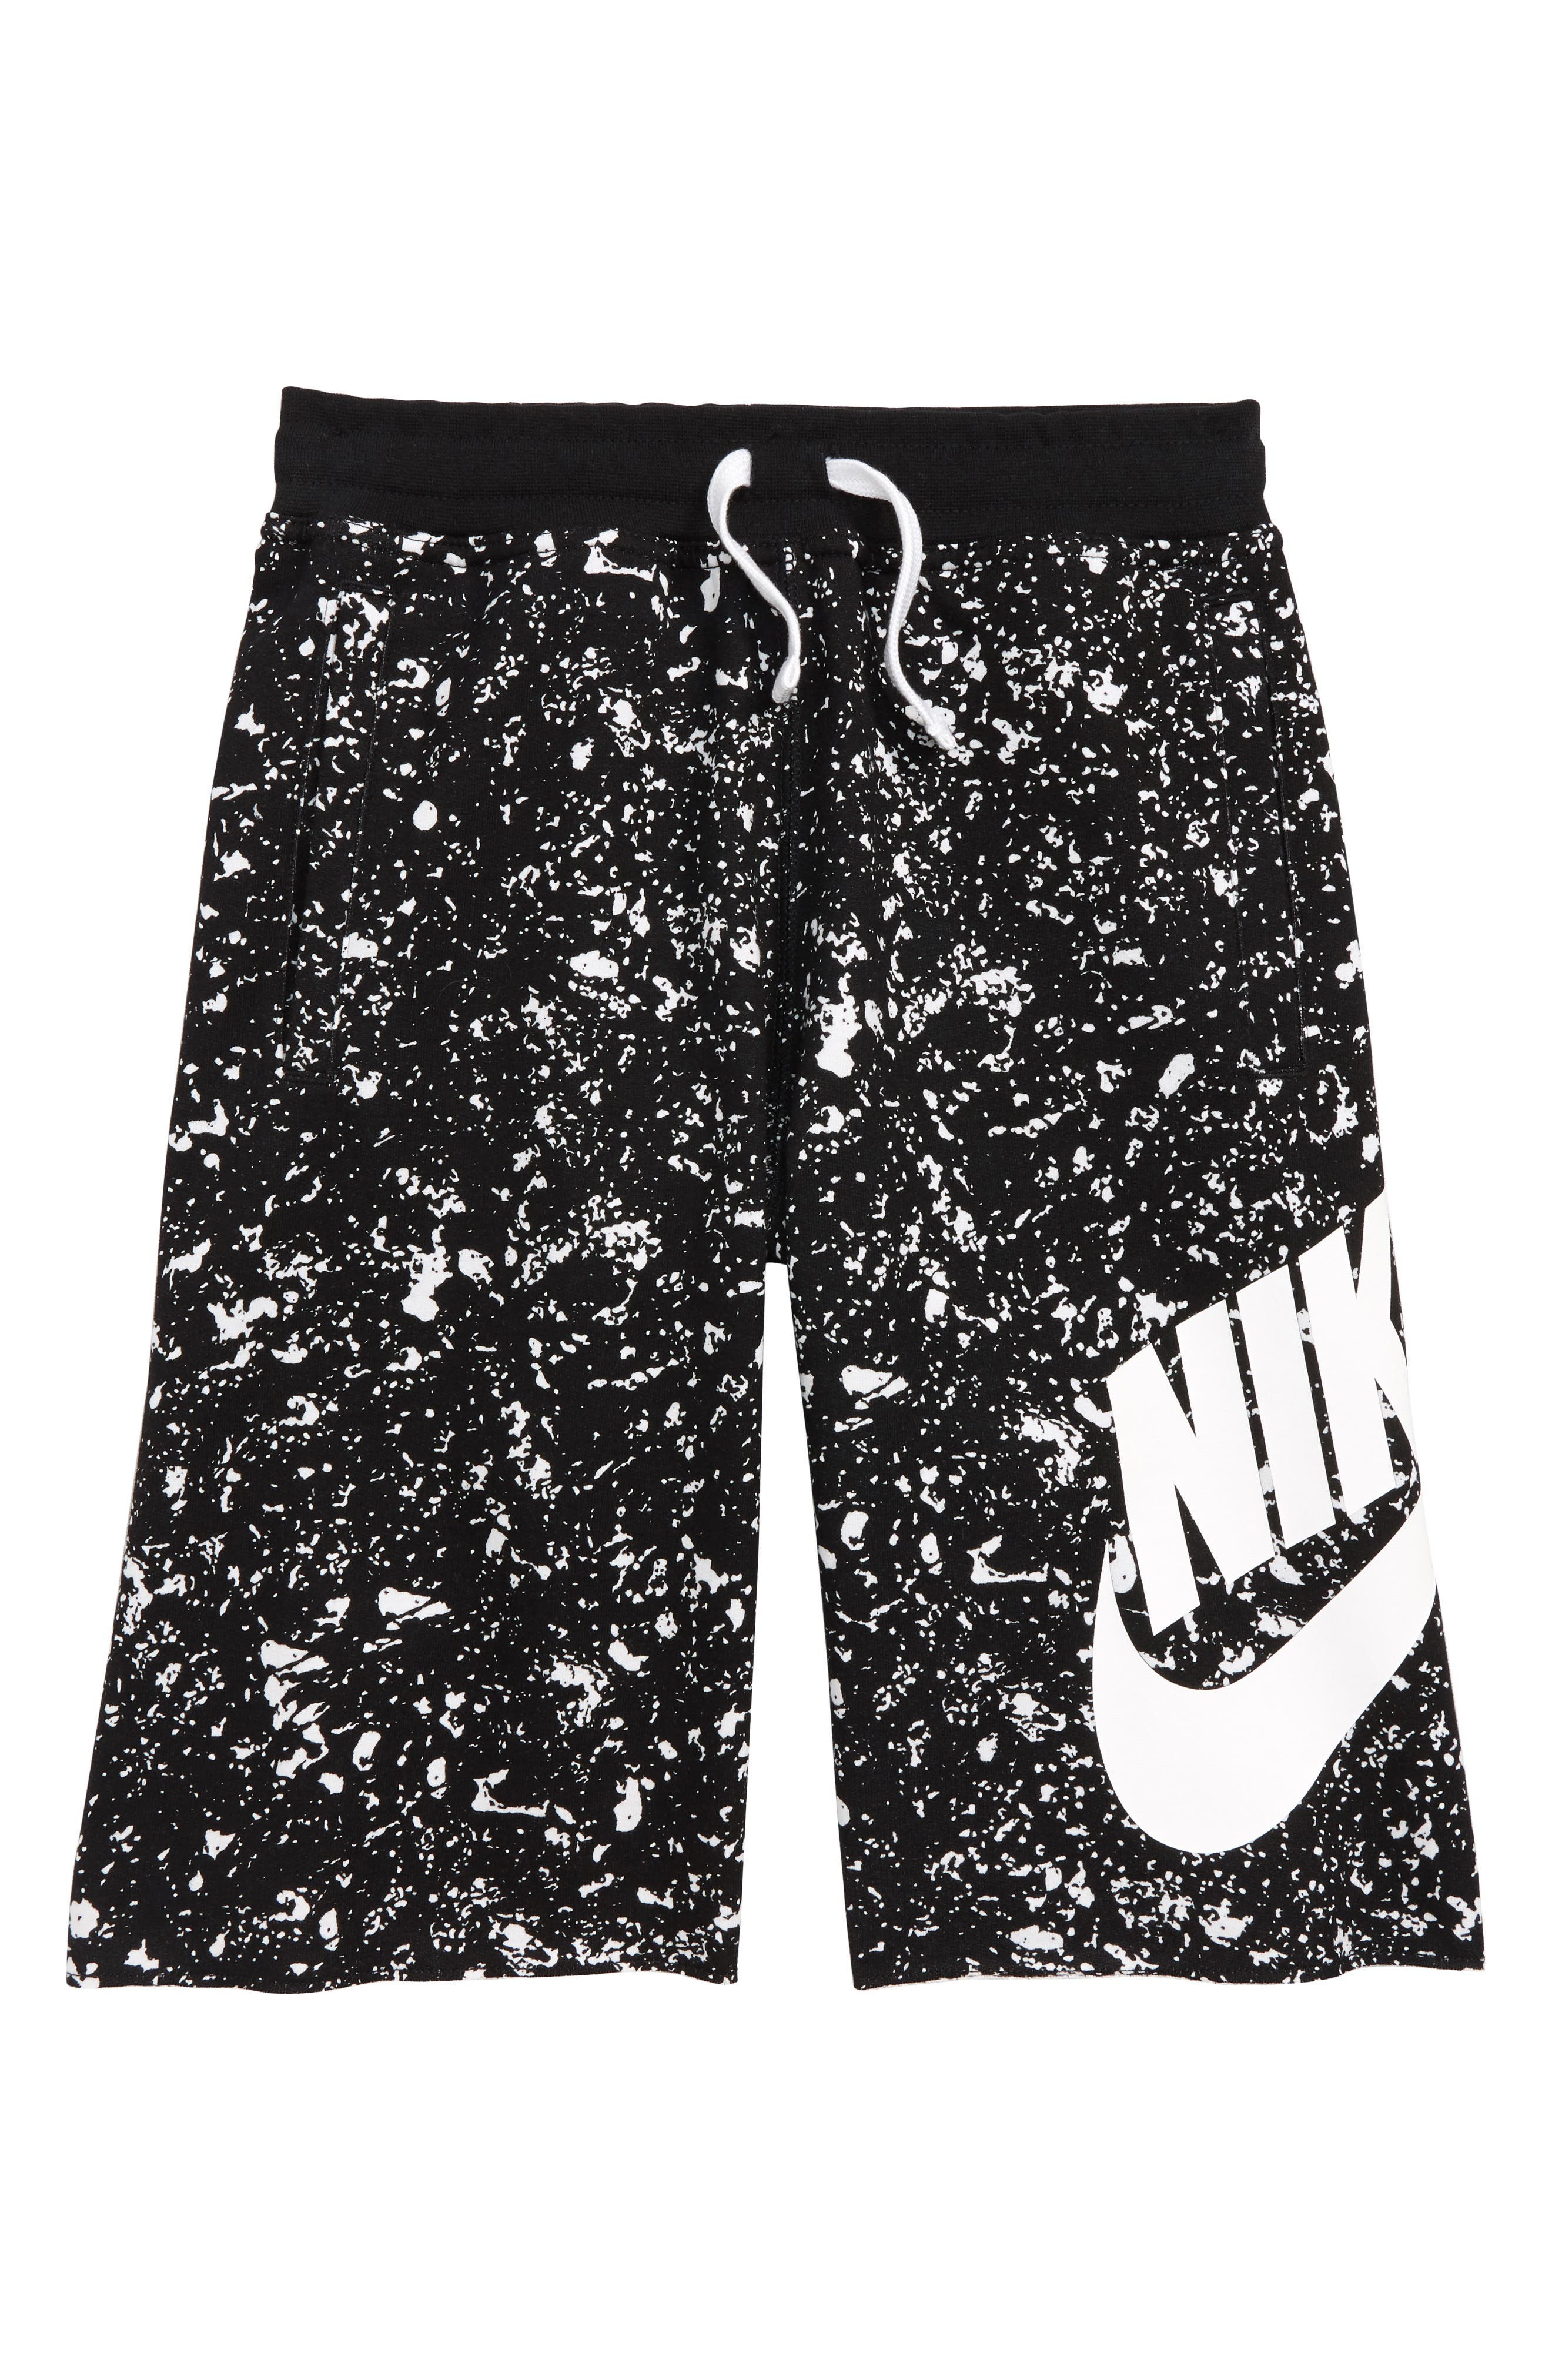 Sportswear Alumni Shorts,                             Main thumbnail 1, color,                             010